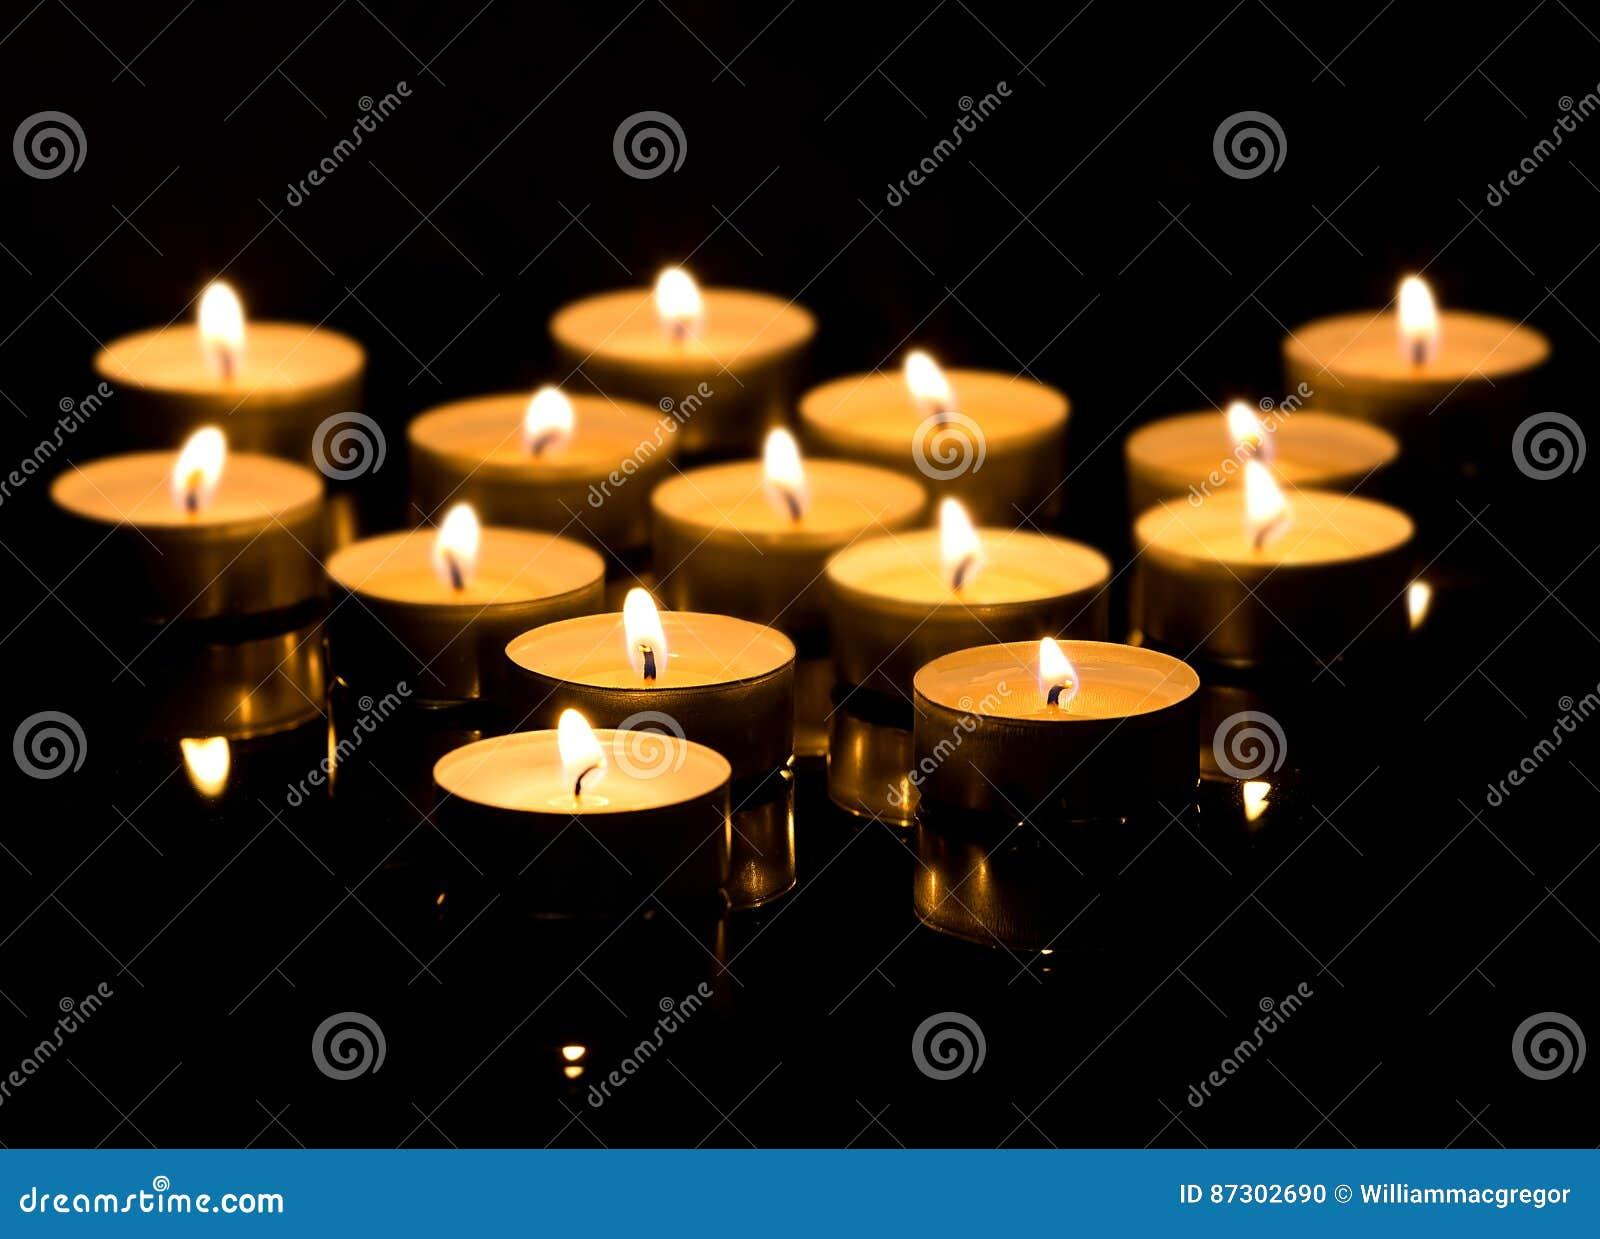 Christmas candles burning.